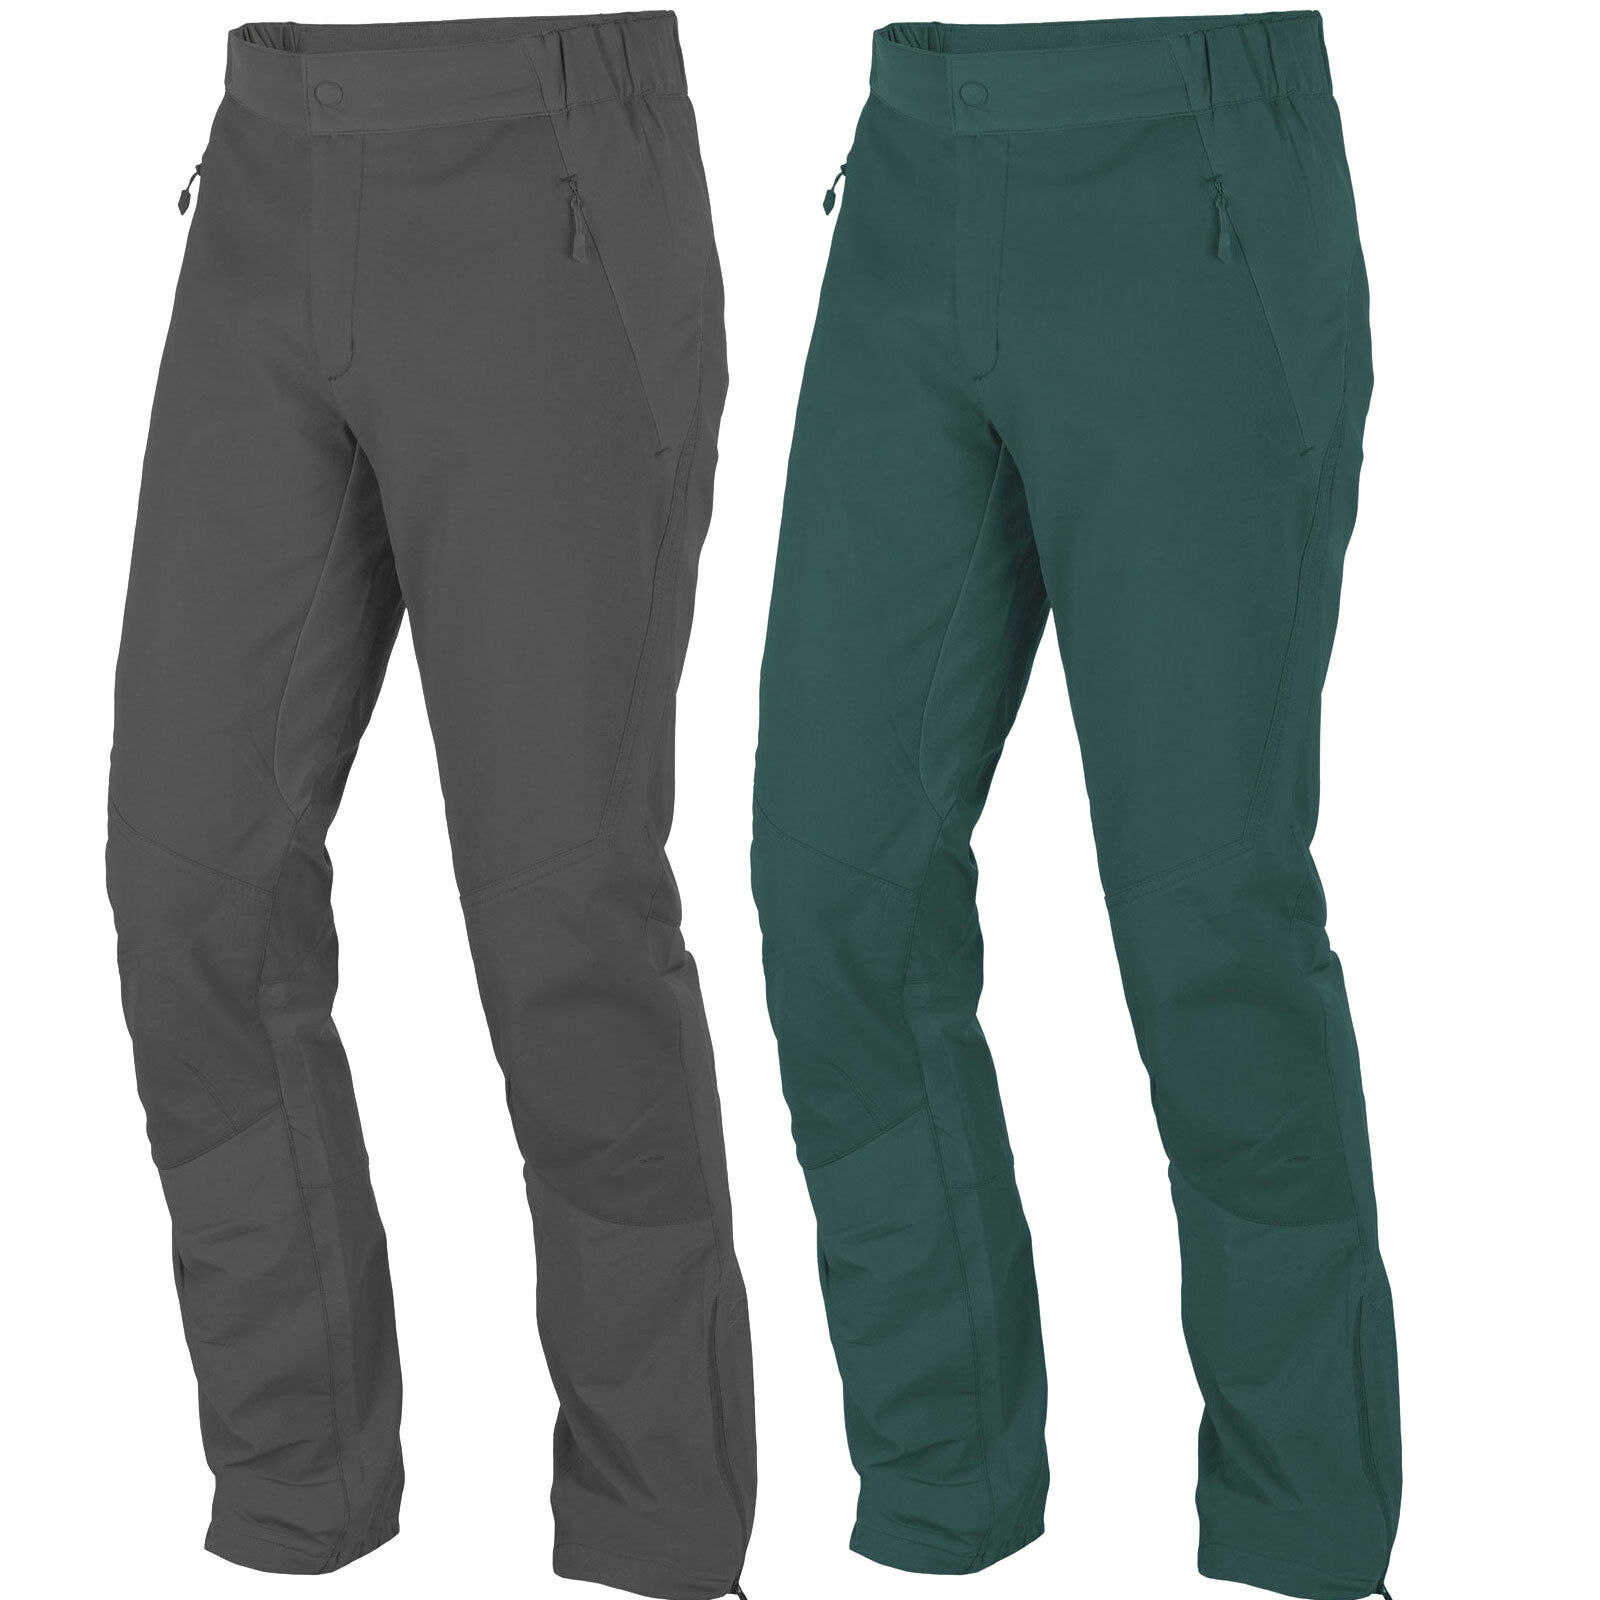 Salewa Orval 5.0 Pant Trekre Pant s Hire Water Hire pantaloni outdoor nuovo